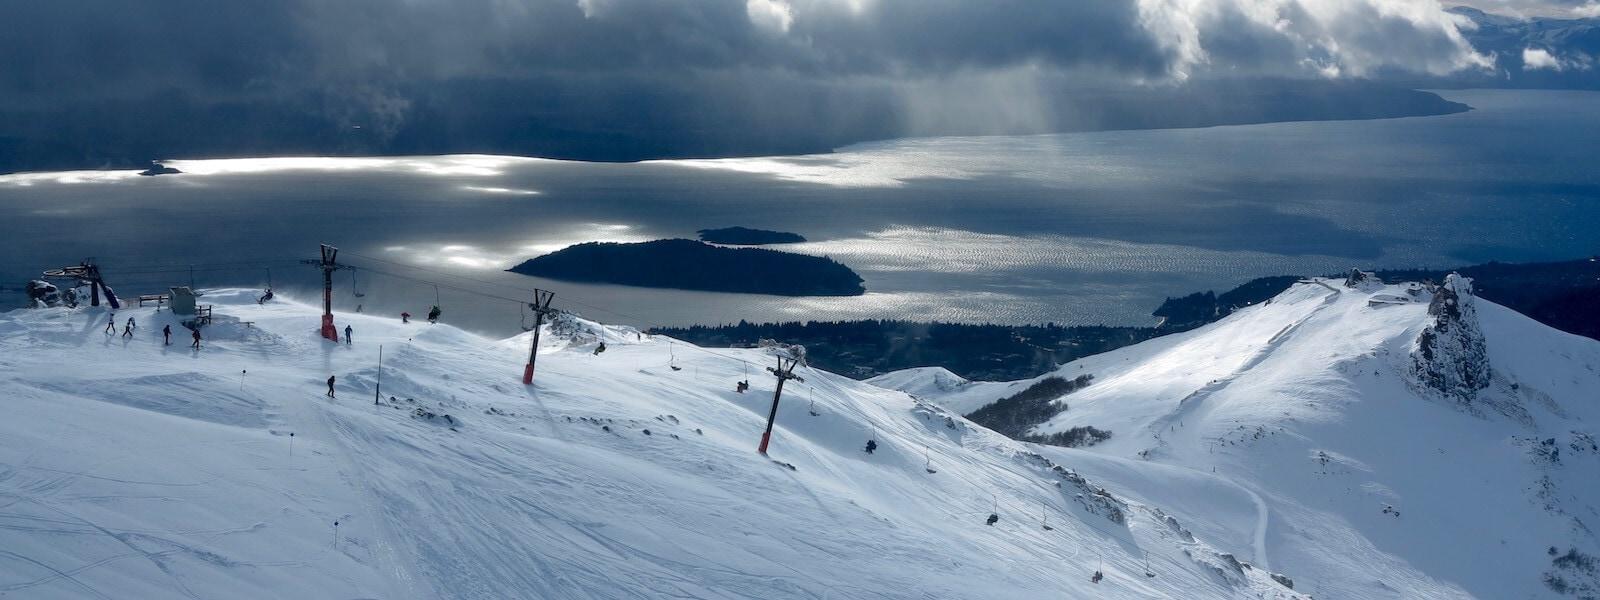 buenos aires ski resorts